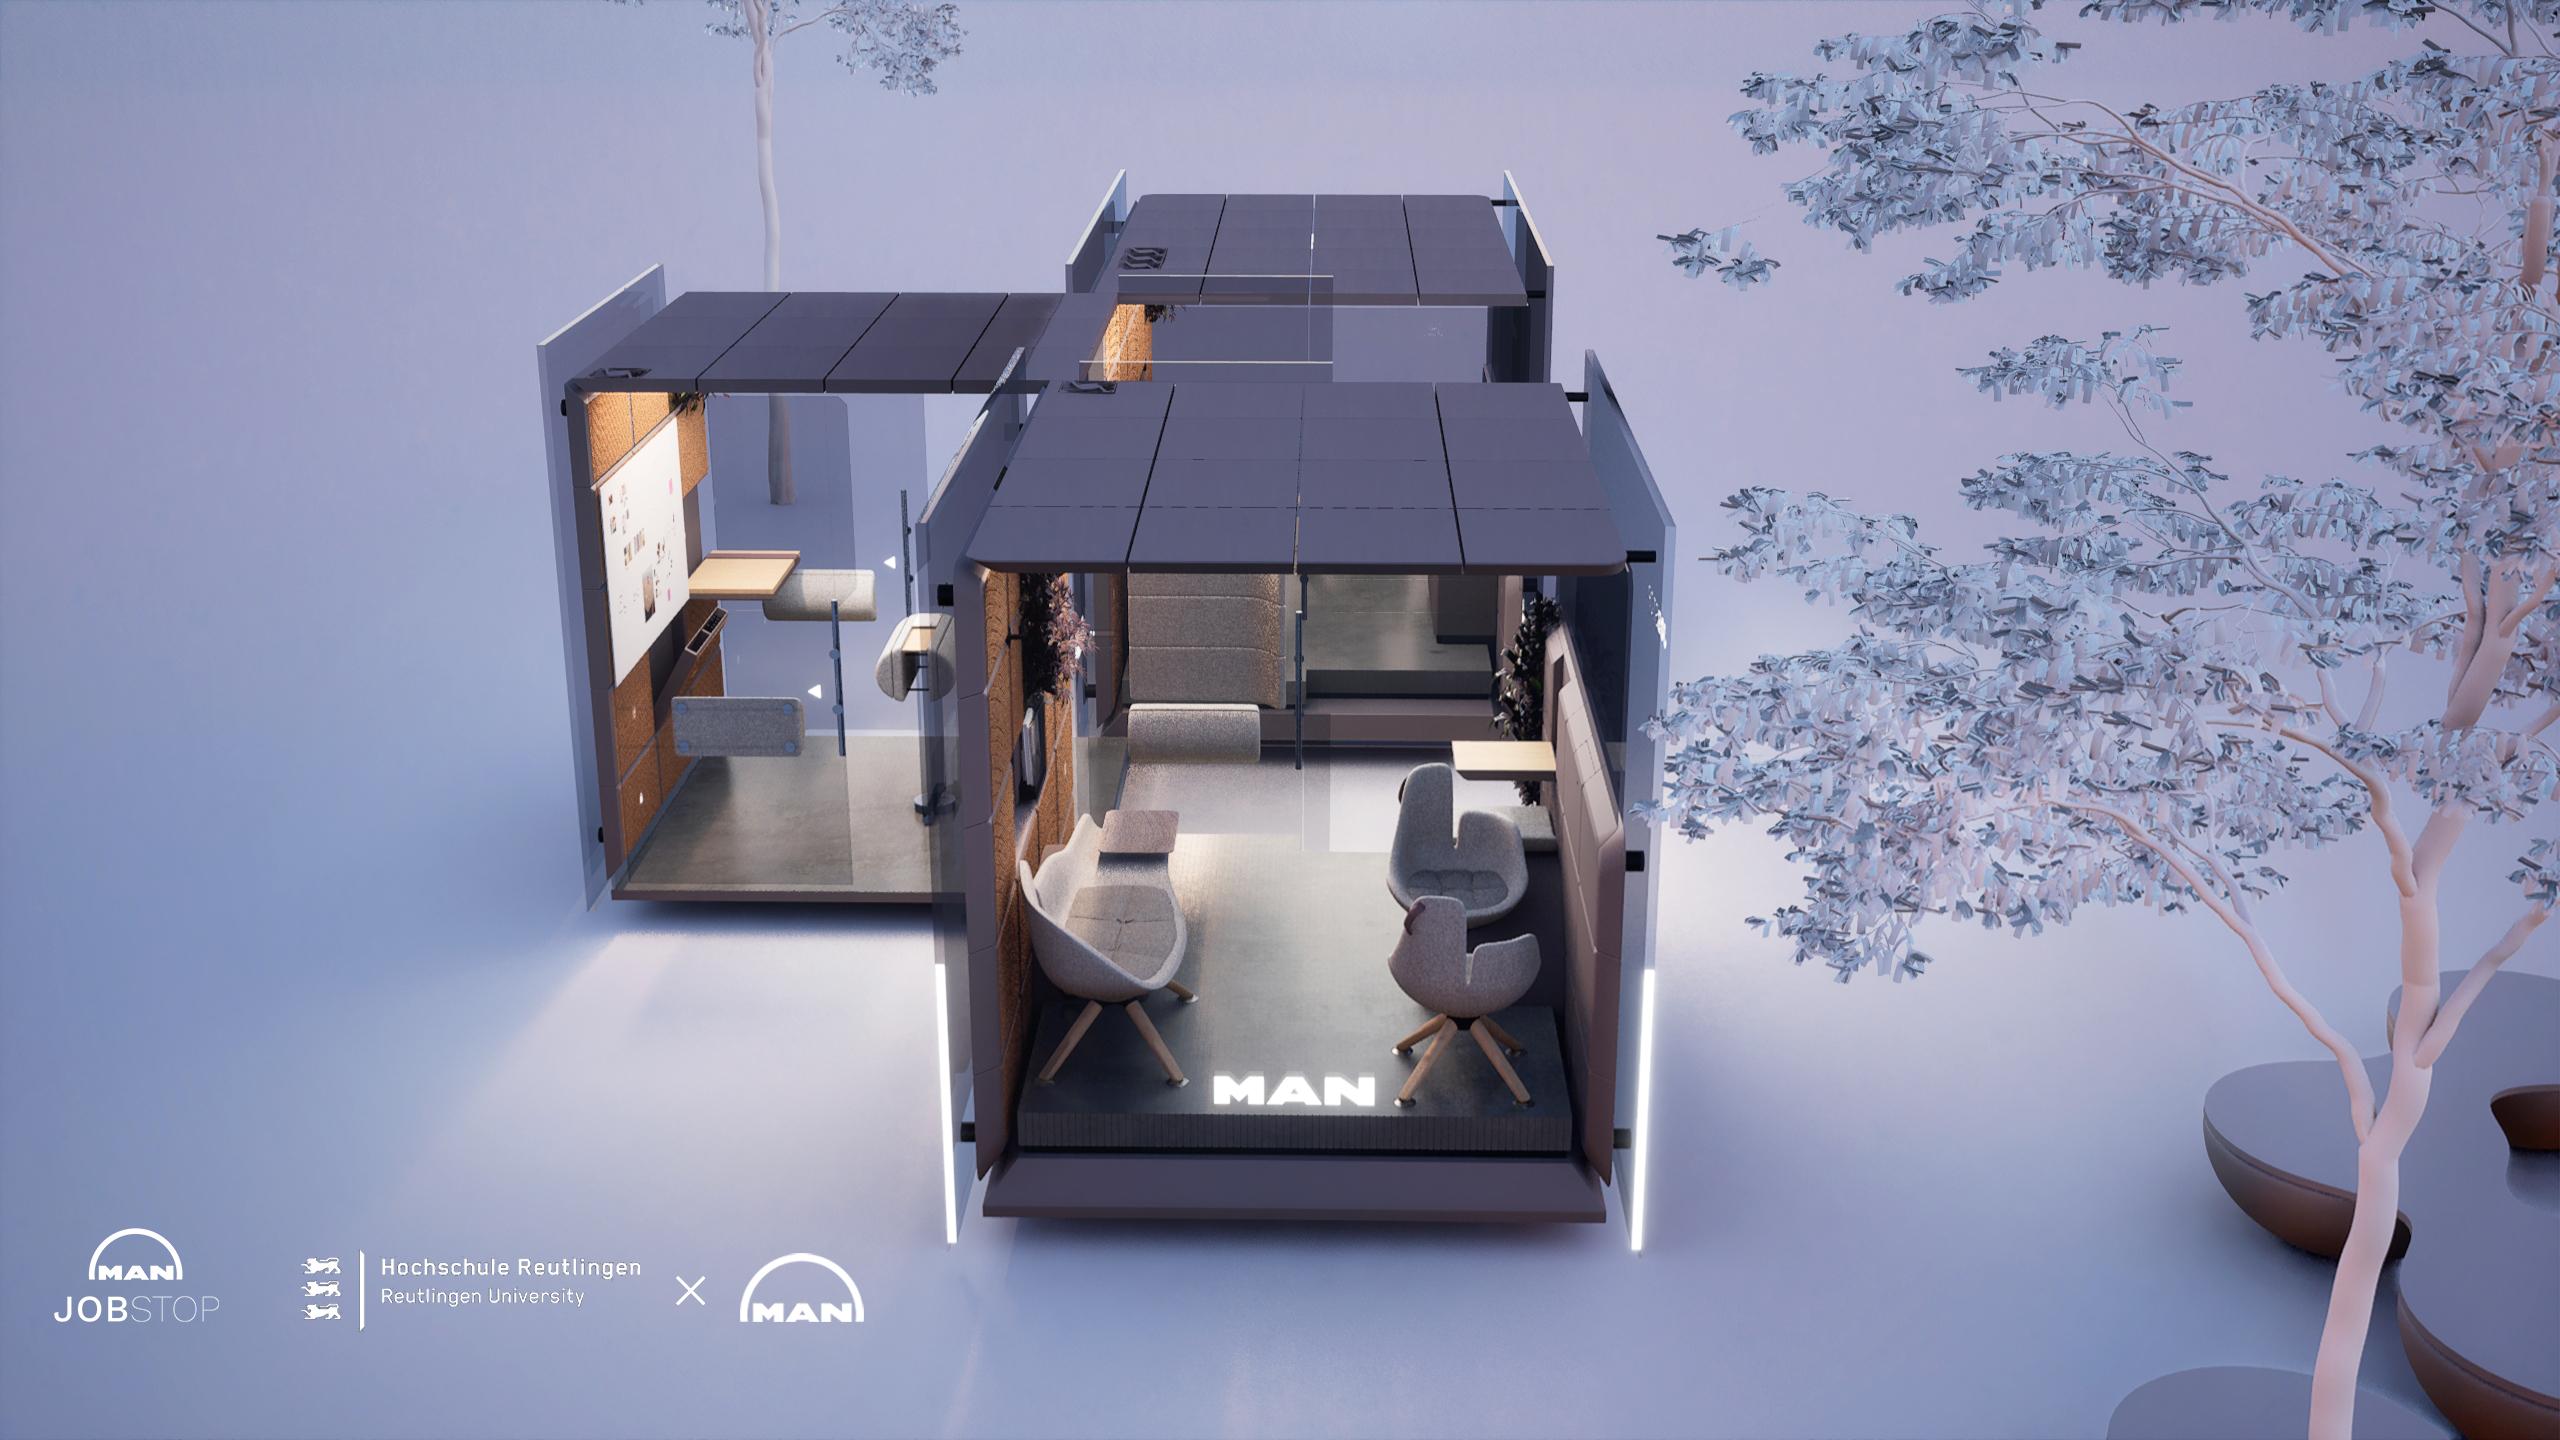 MAN JobStop - MA 1